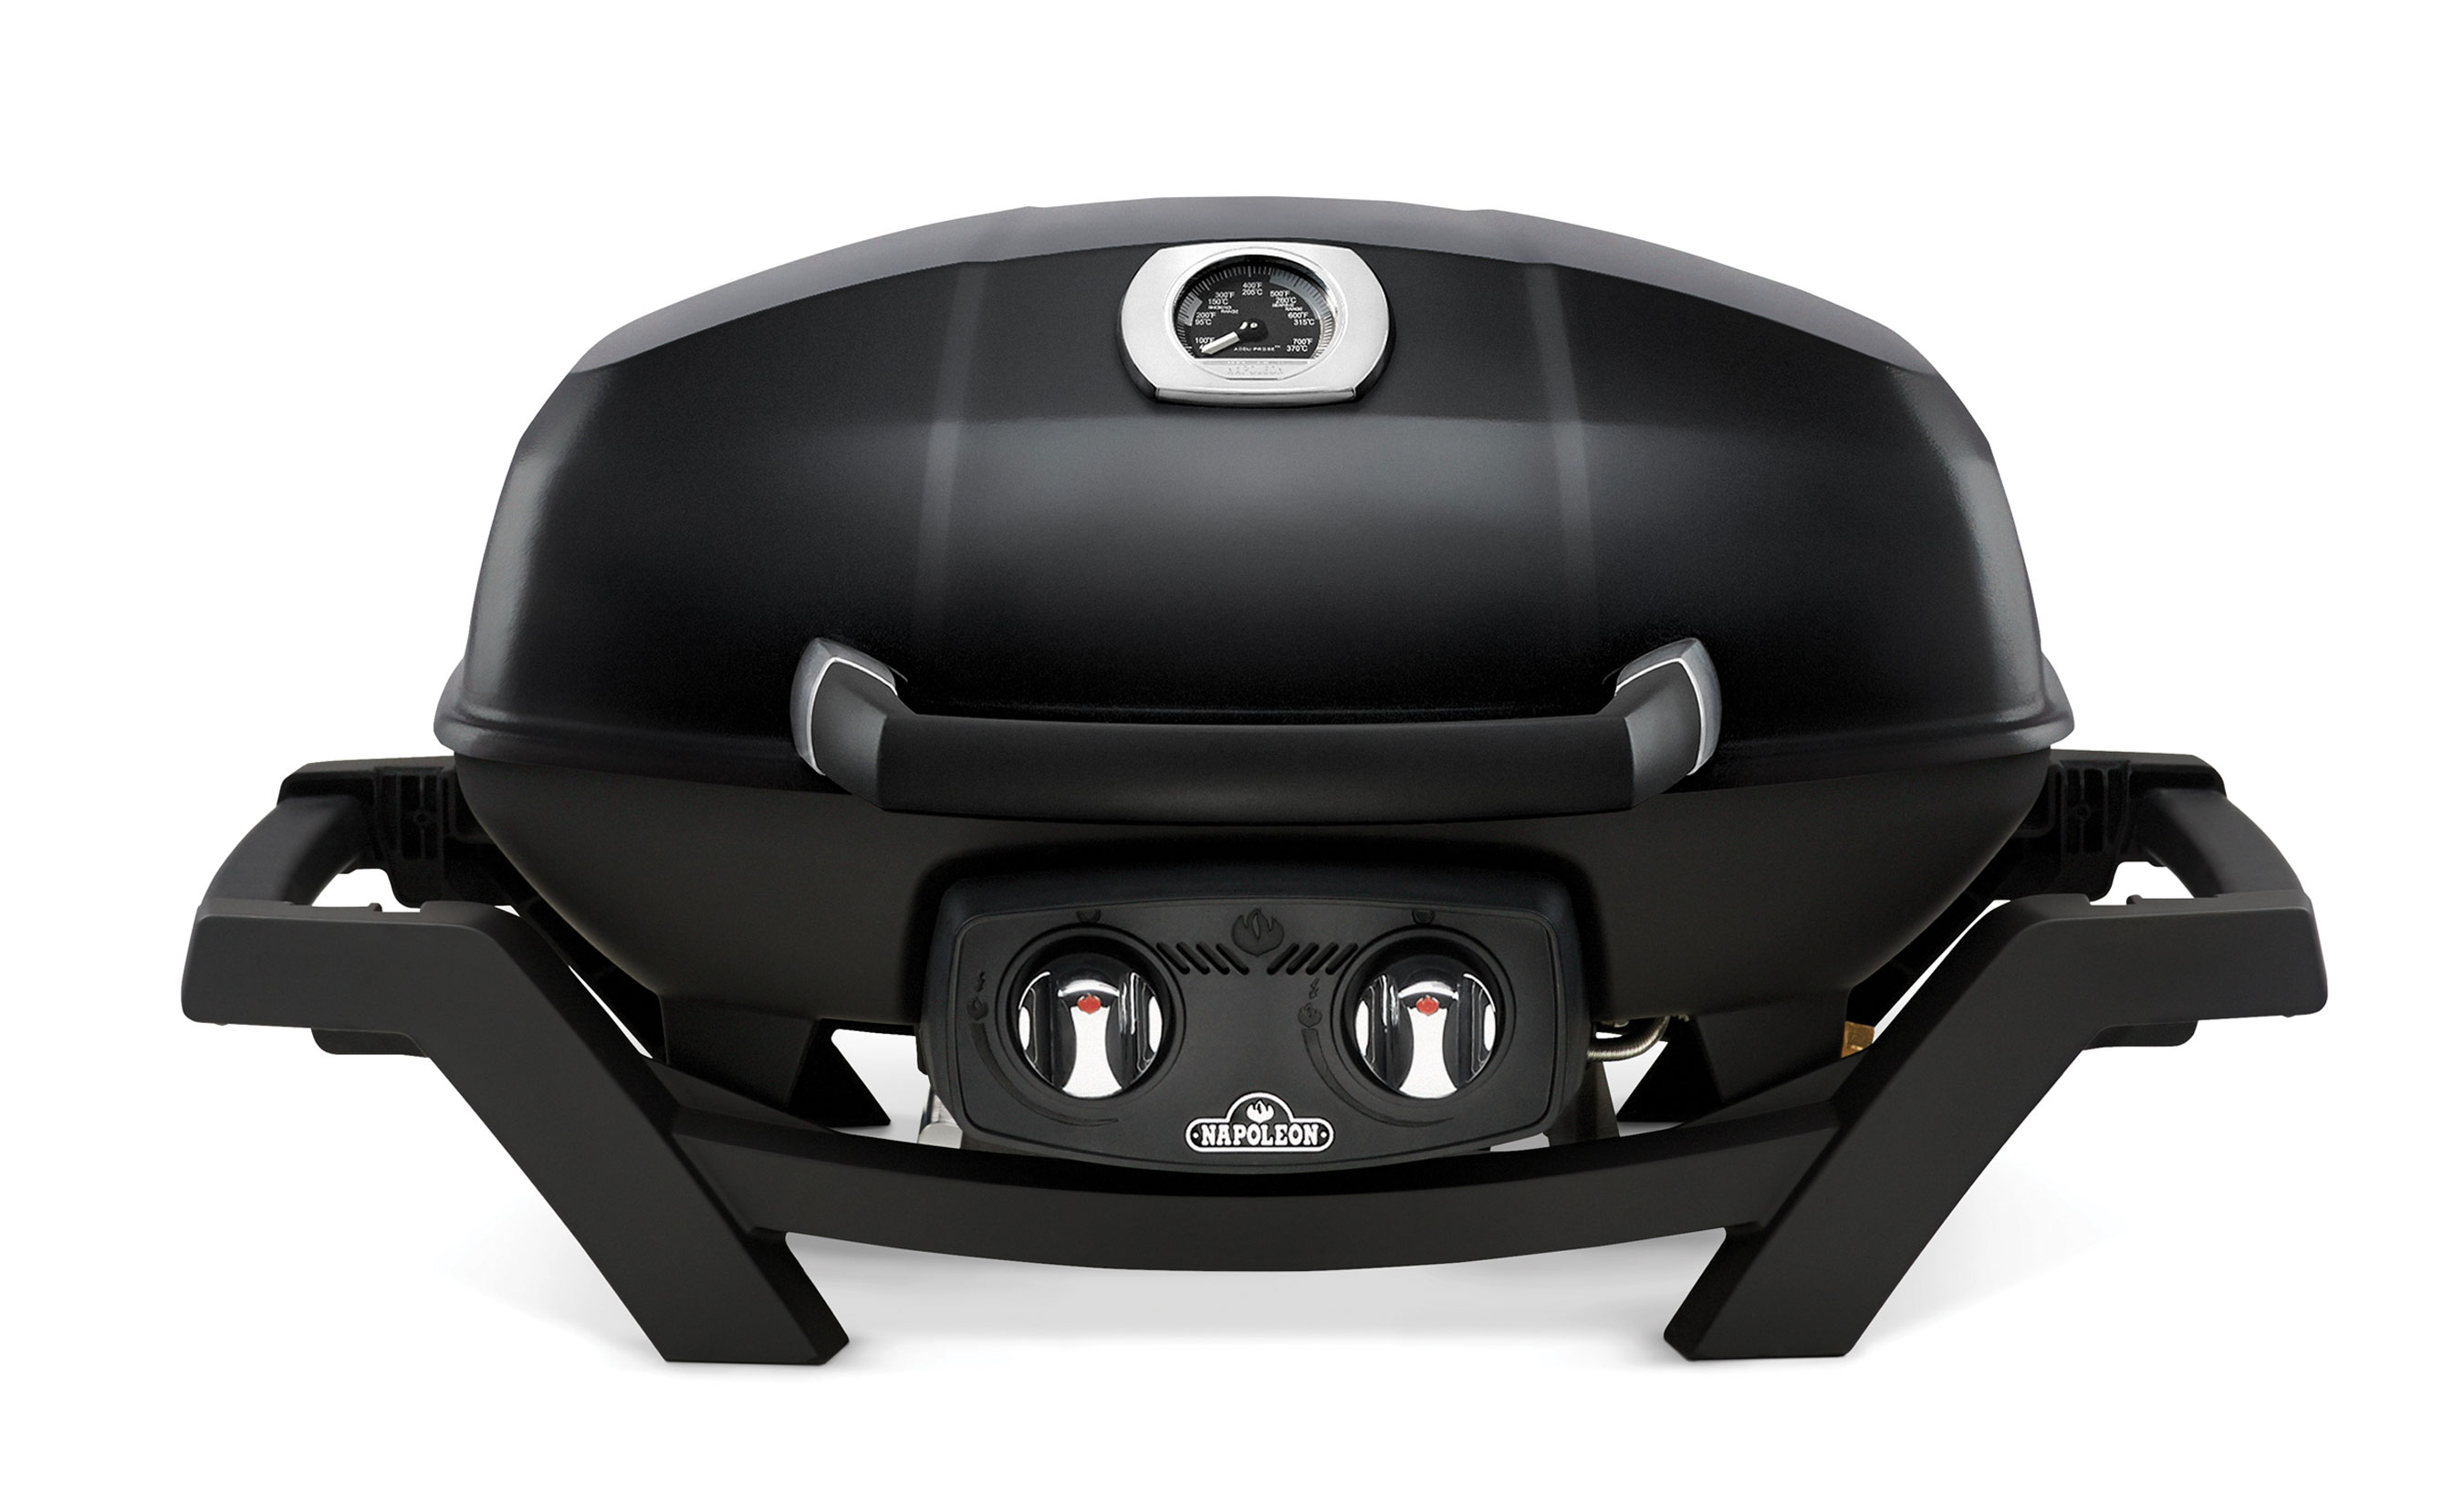 gasgrill tischgrill napoleon travelq pro285 schwarz bei. Black Bedroom Furniture Sets. Home Design Ideas